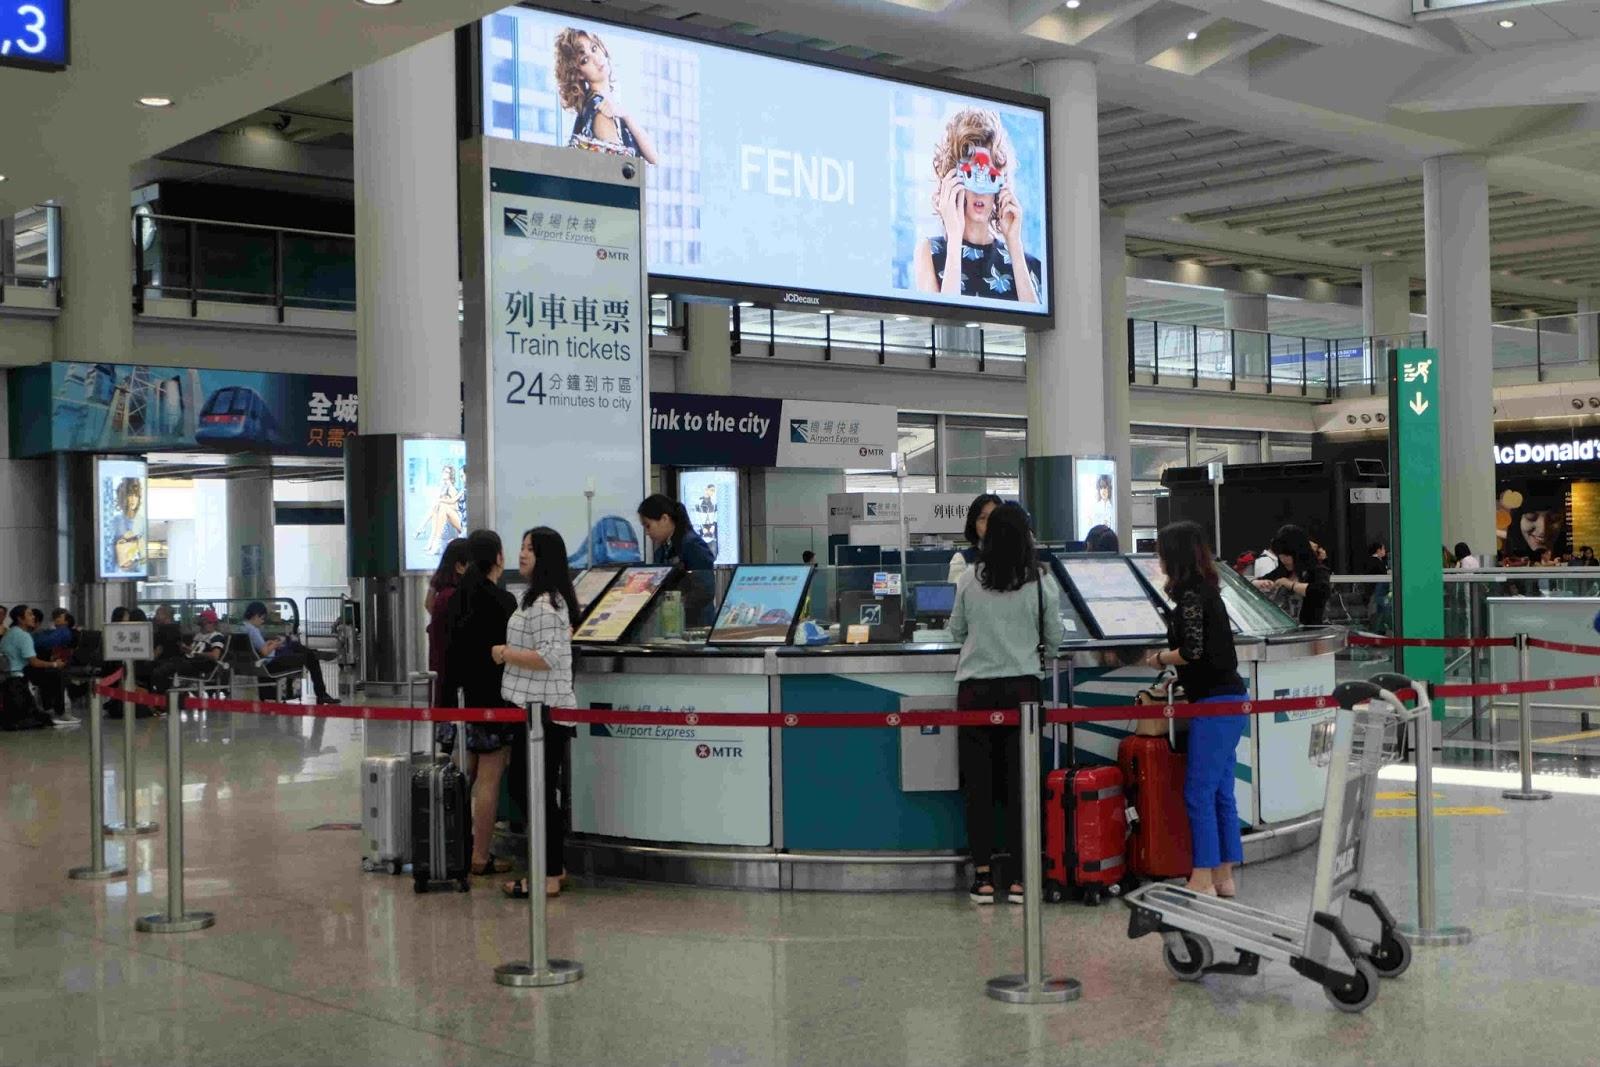 Transportasi Umum Di Hongkong Food Travel And Lifestyle Blog Peta Mtr Disneyland Airport Counter Ticket Machine